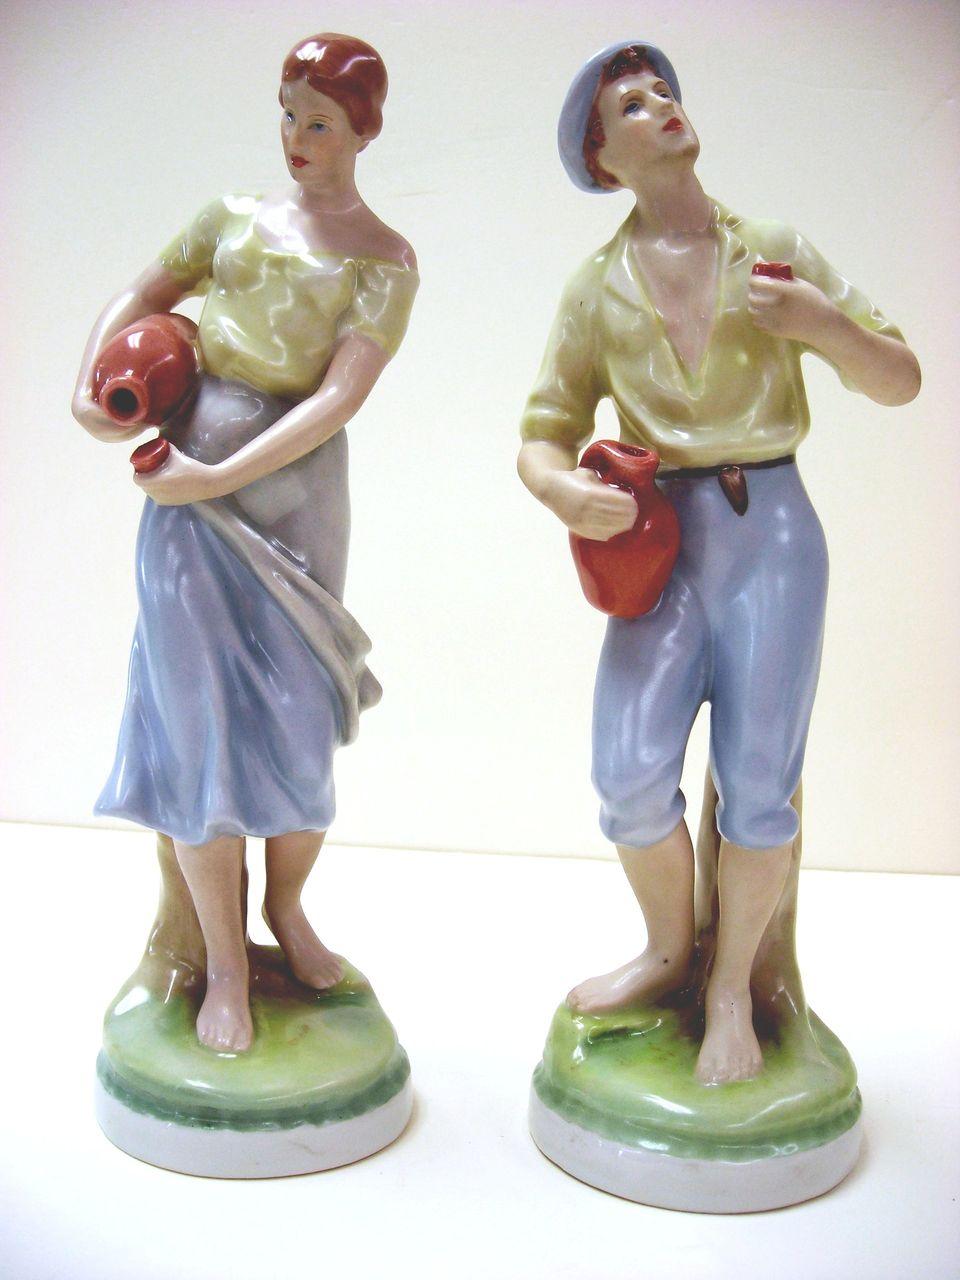 Royal Dux Porcelain Figurines,  Young Couple - Czechoslovakia